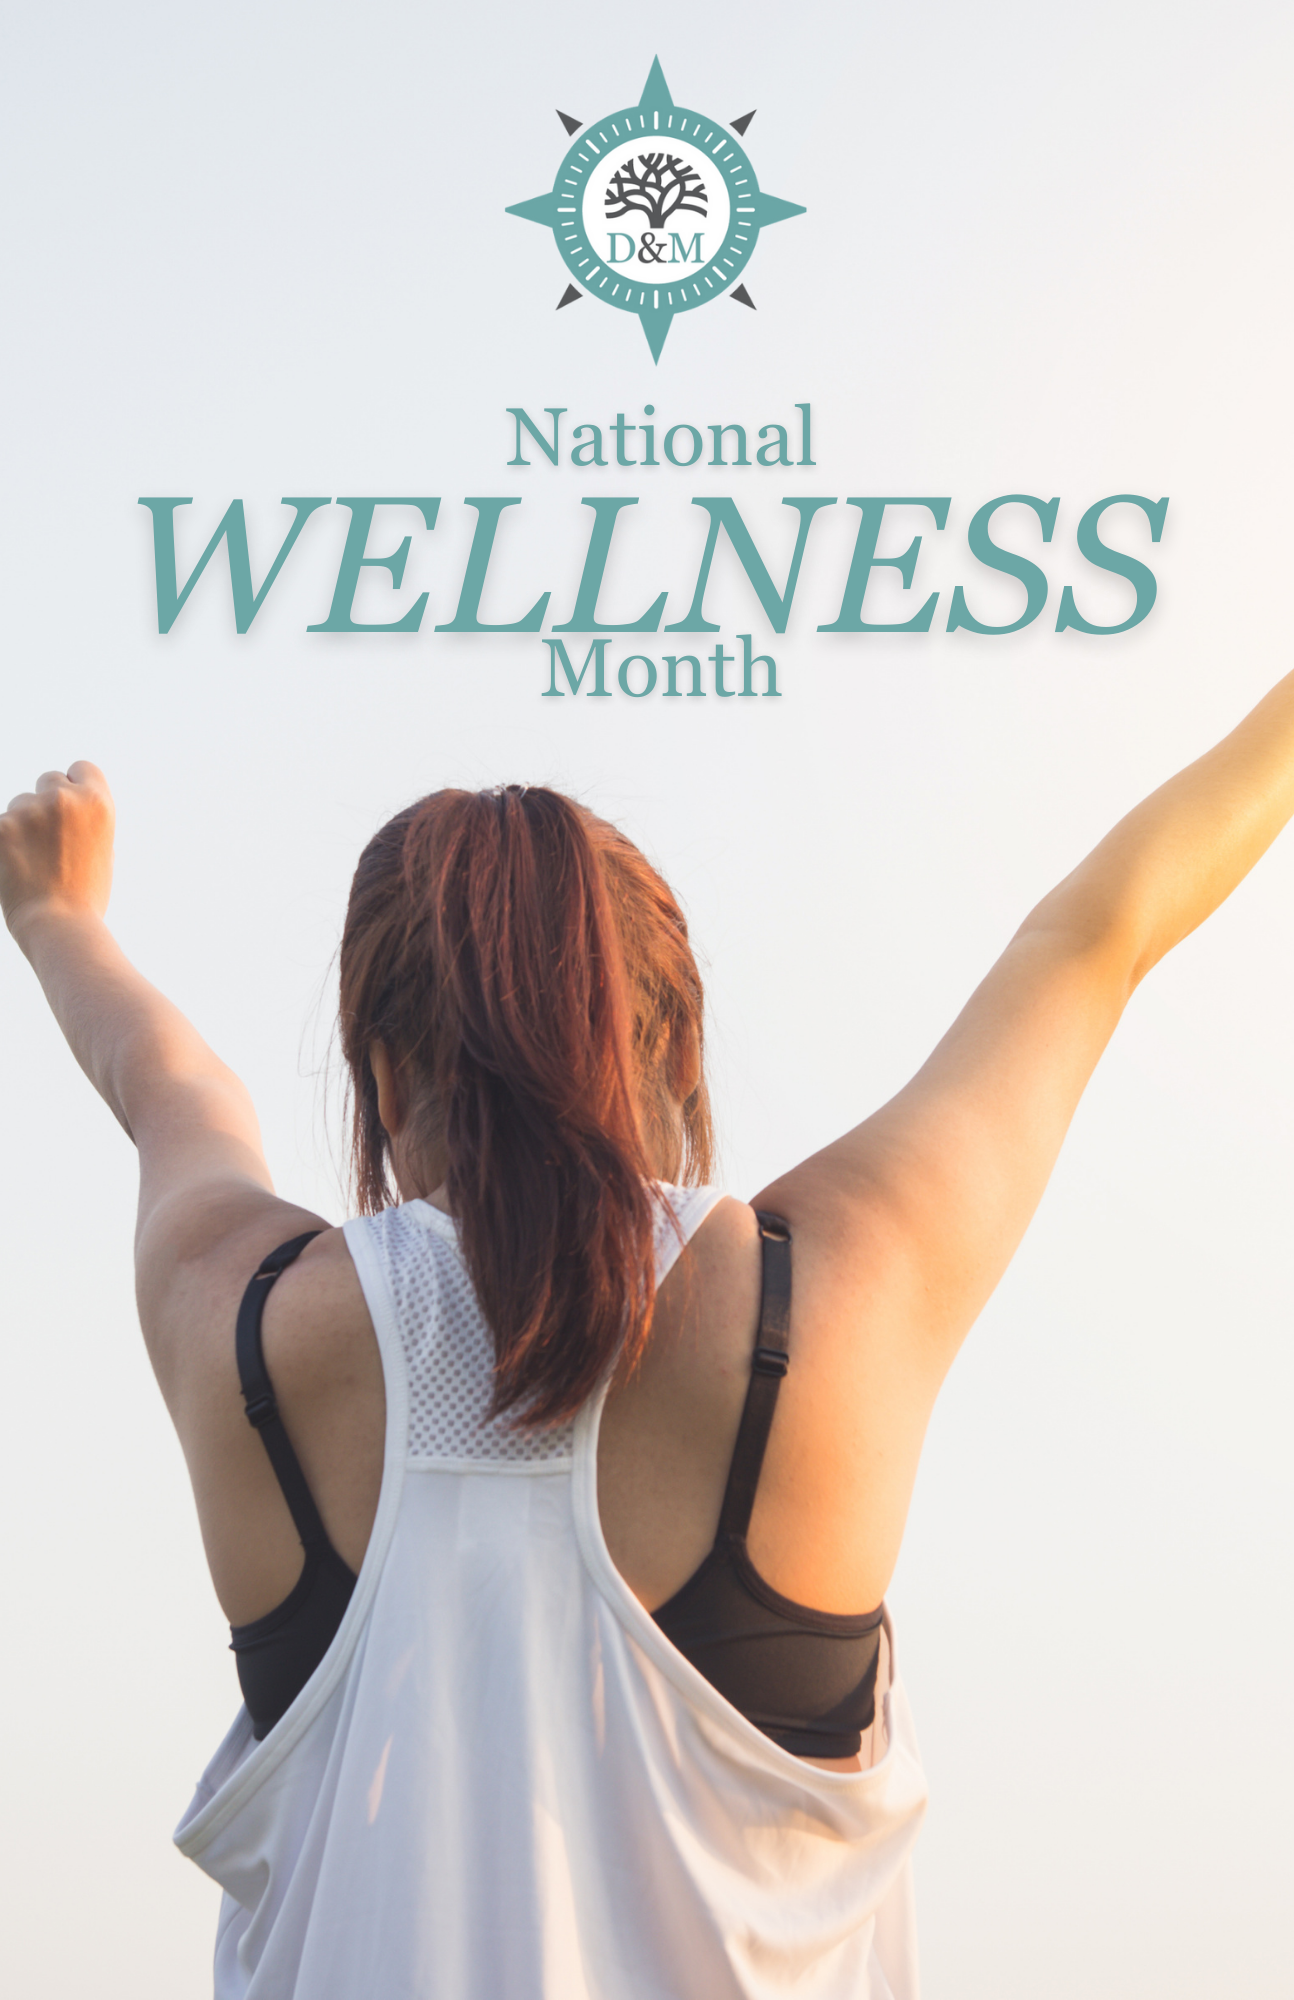 National Wellness Month